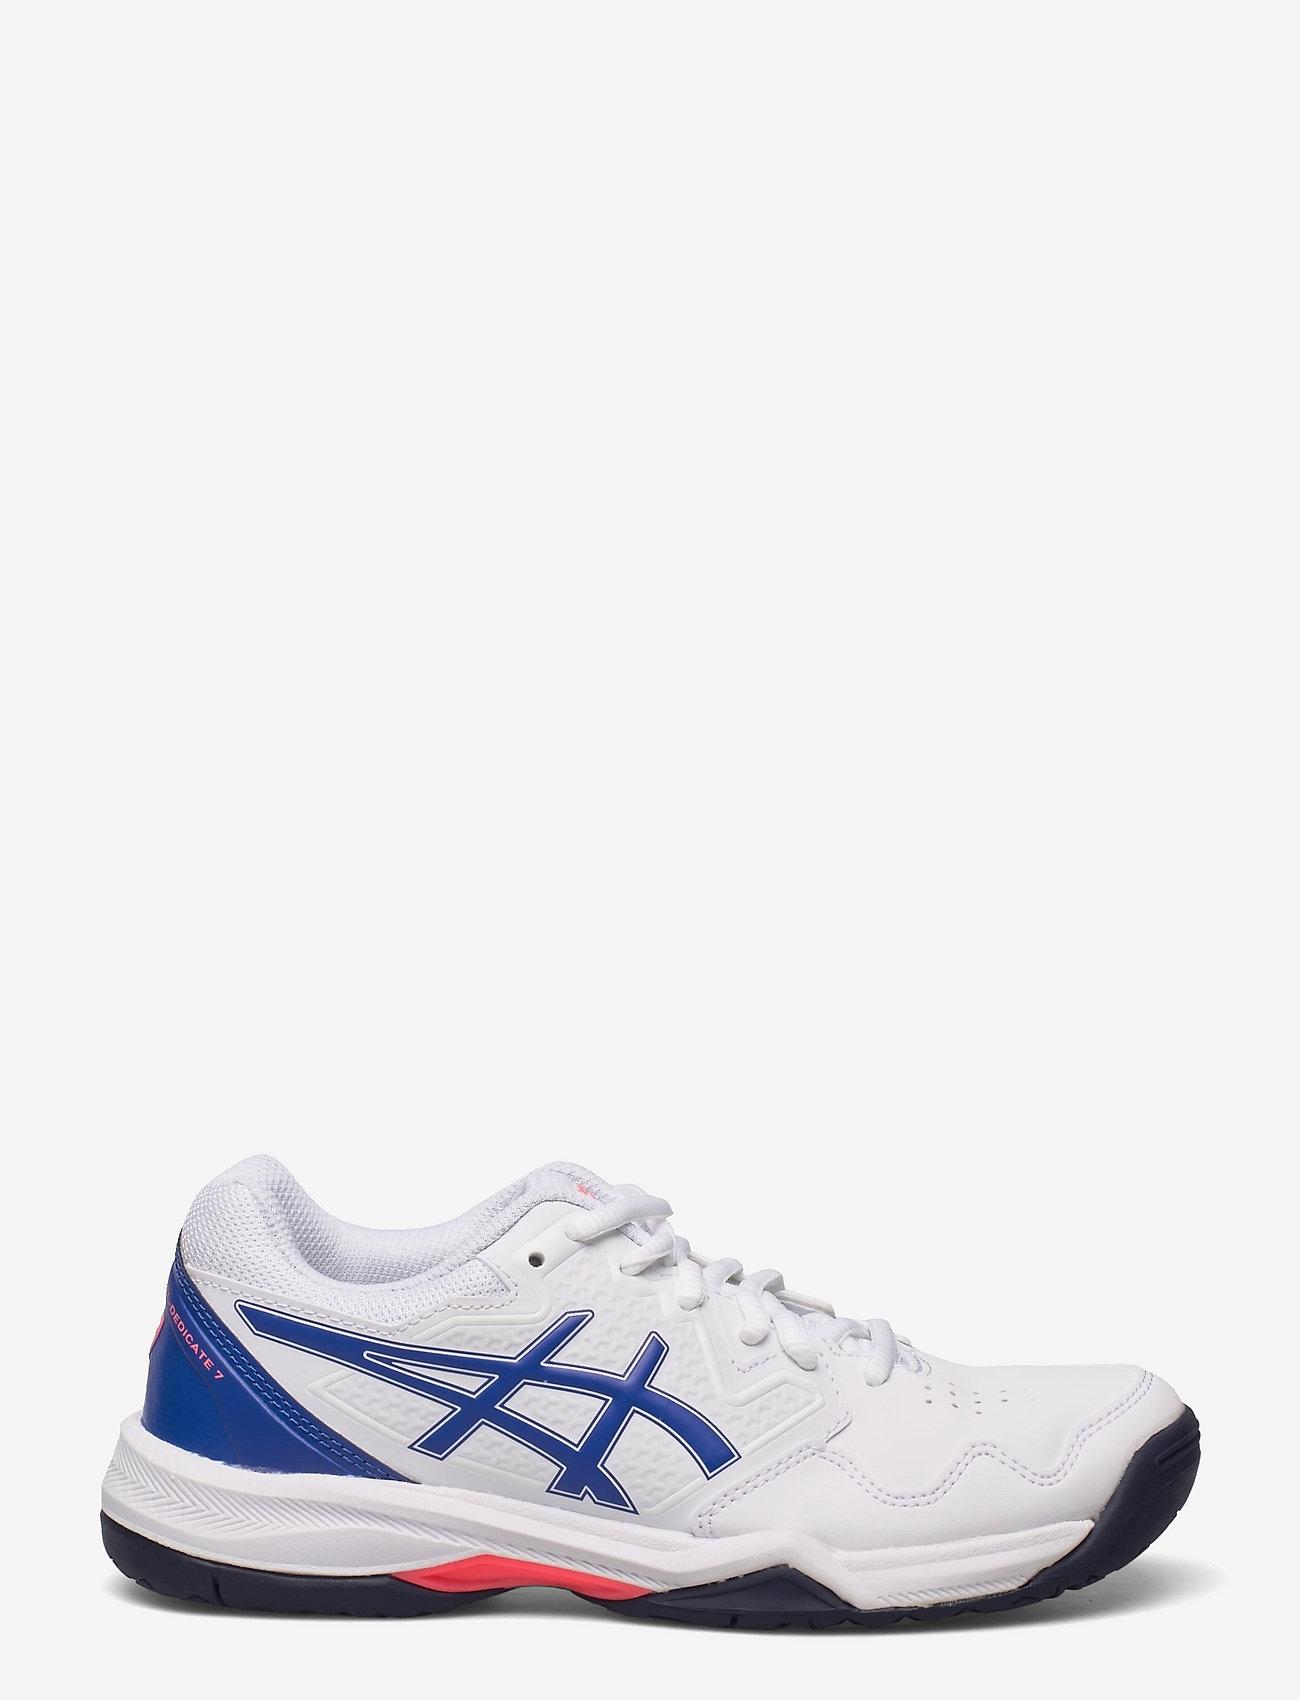 Asics - GEL-DEDICATE 7 - ketsjersportsko - white/lapis lazuli blue - 1